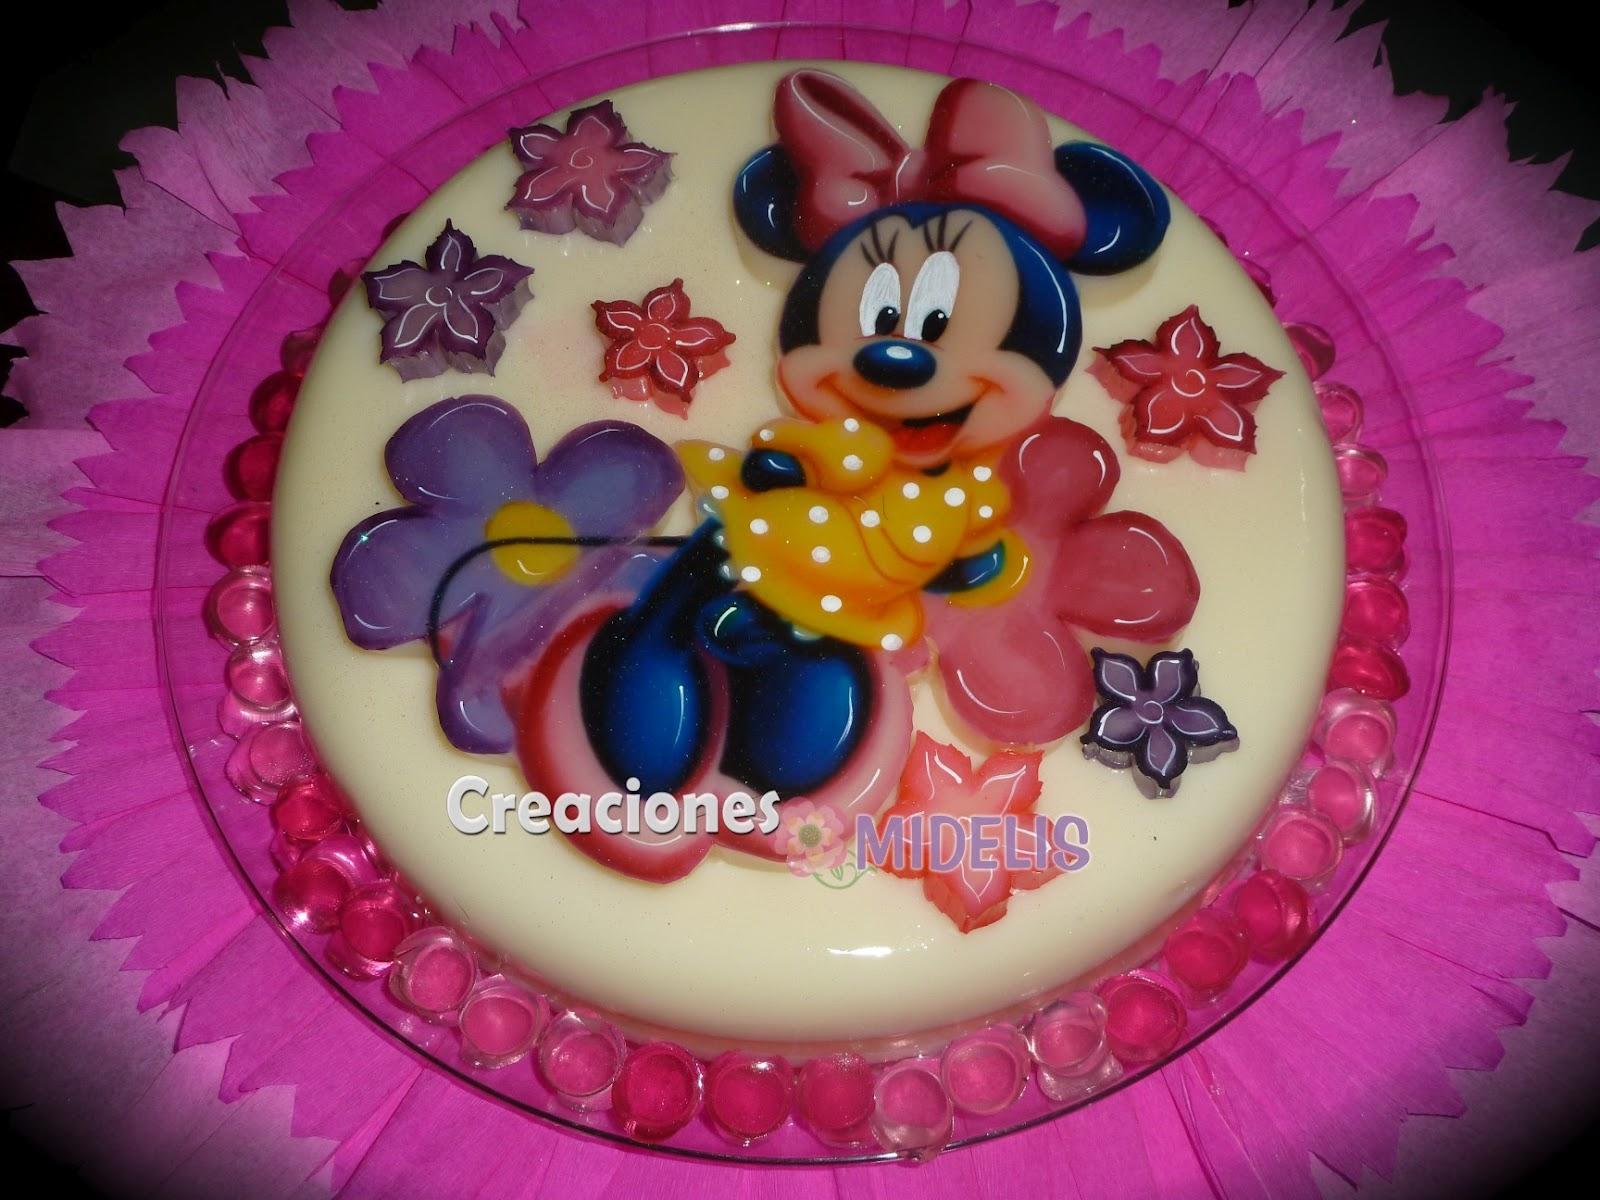 Gelatina de colores Minnie Mouse - Imagui